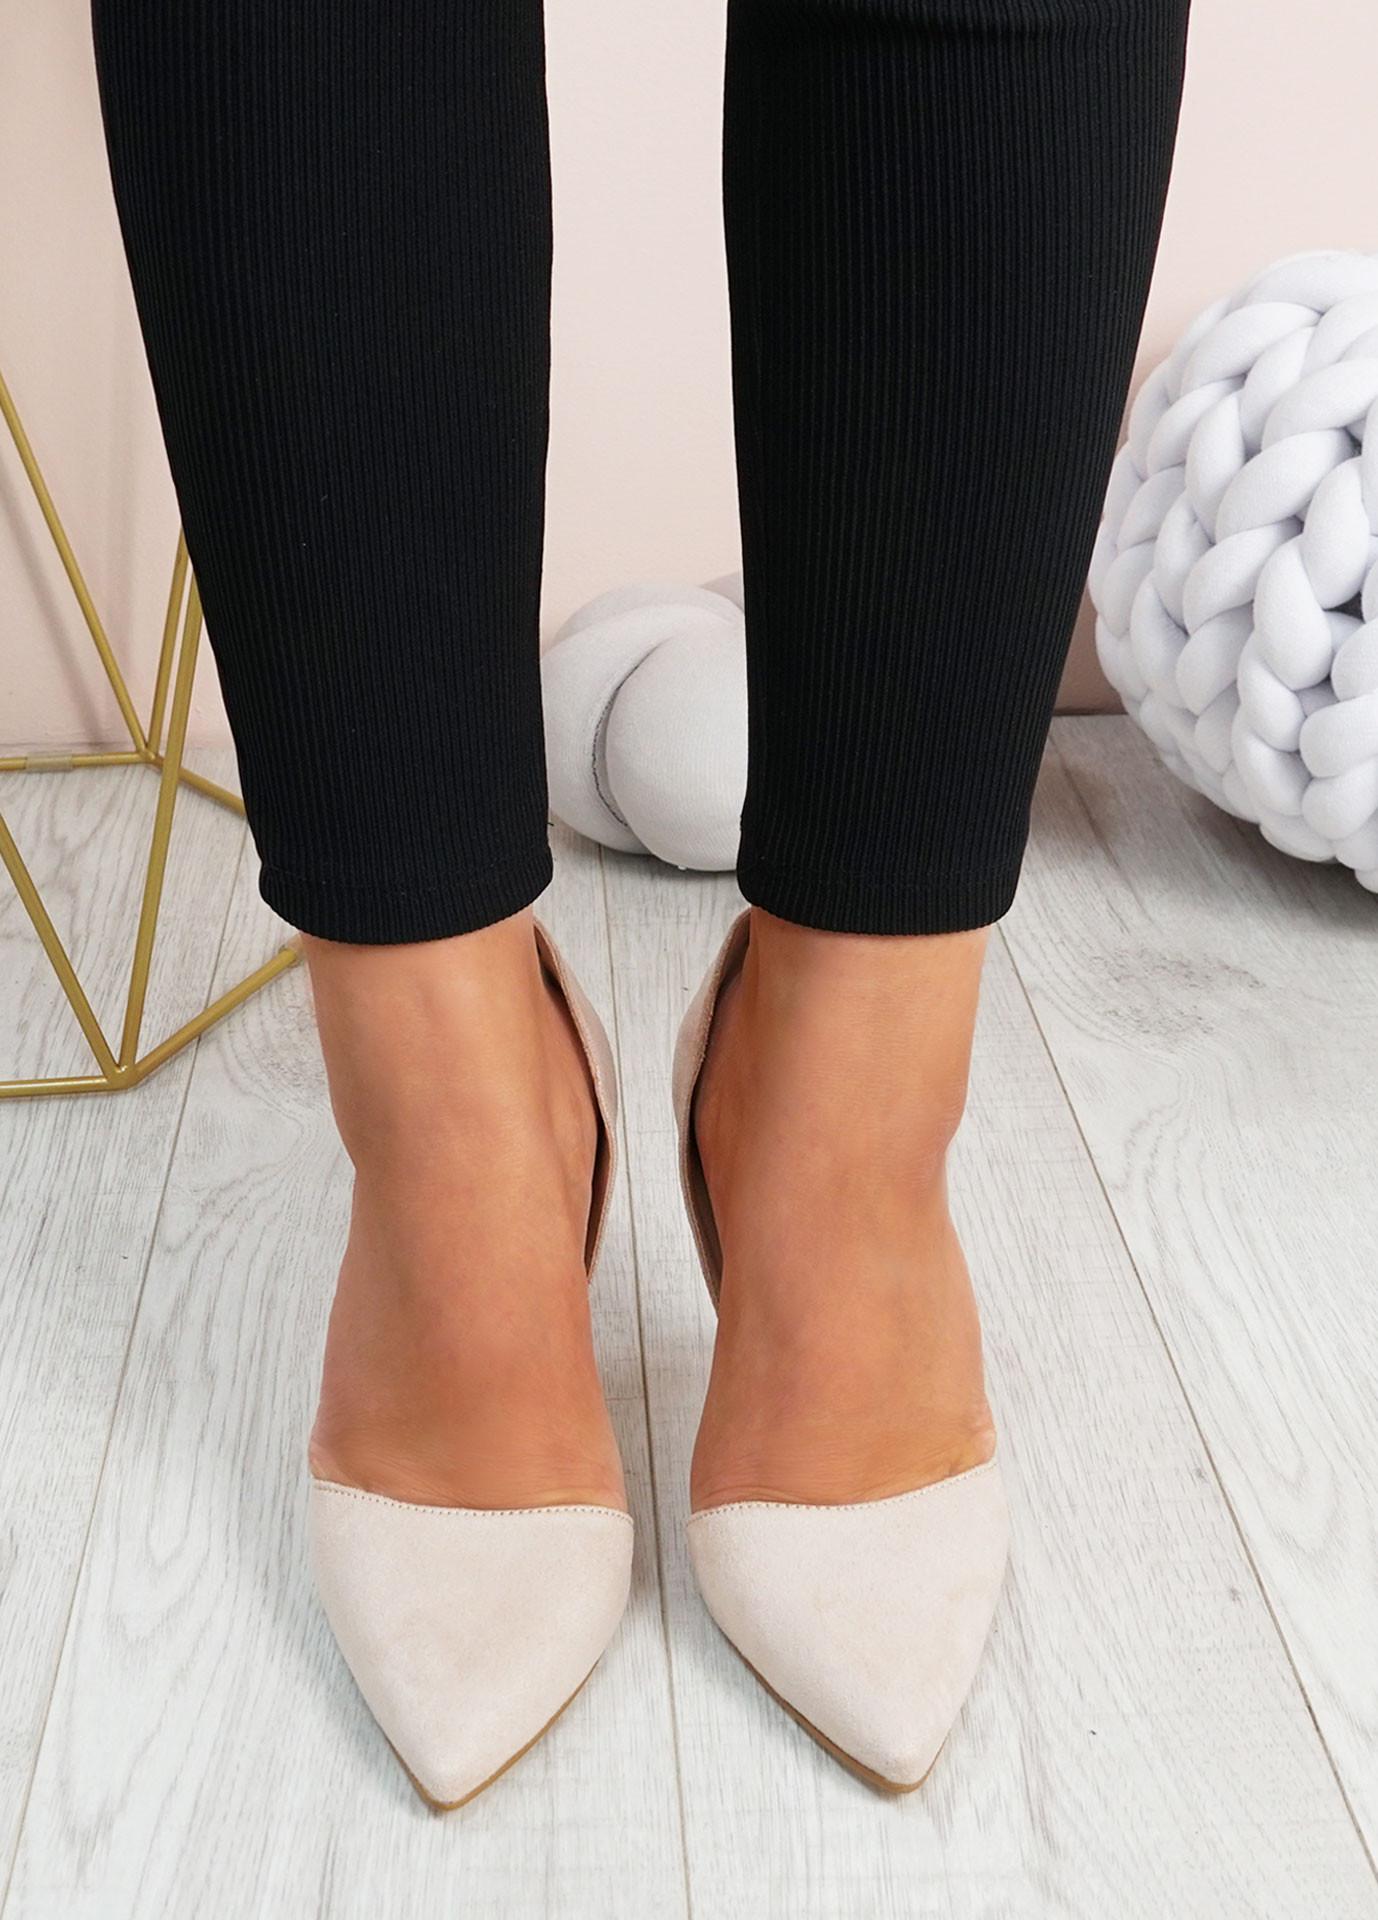 Emelia Nude High Heels Stiletto Shoes